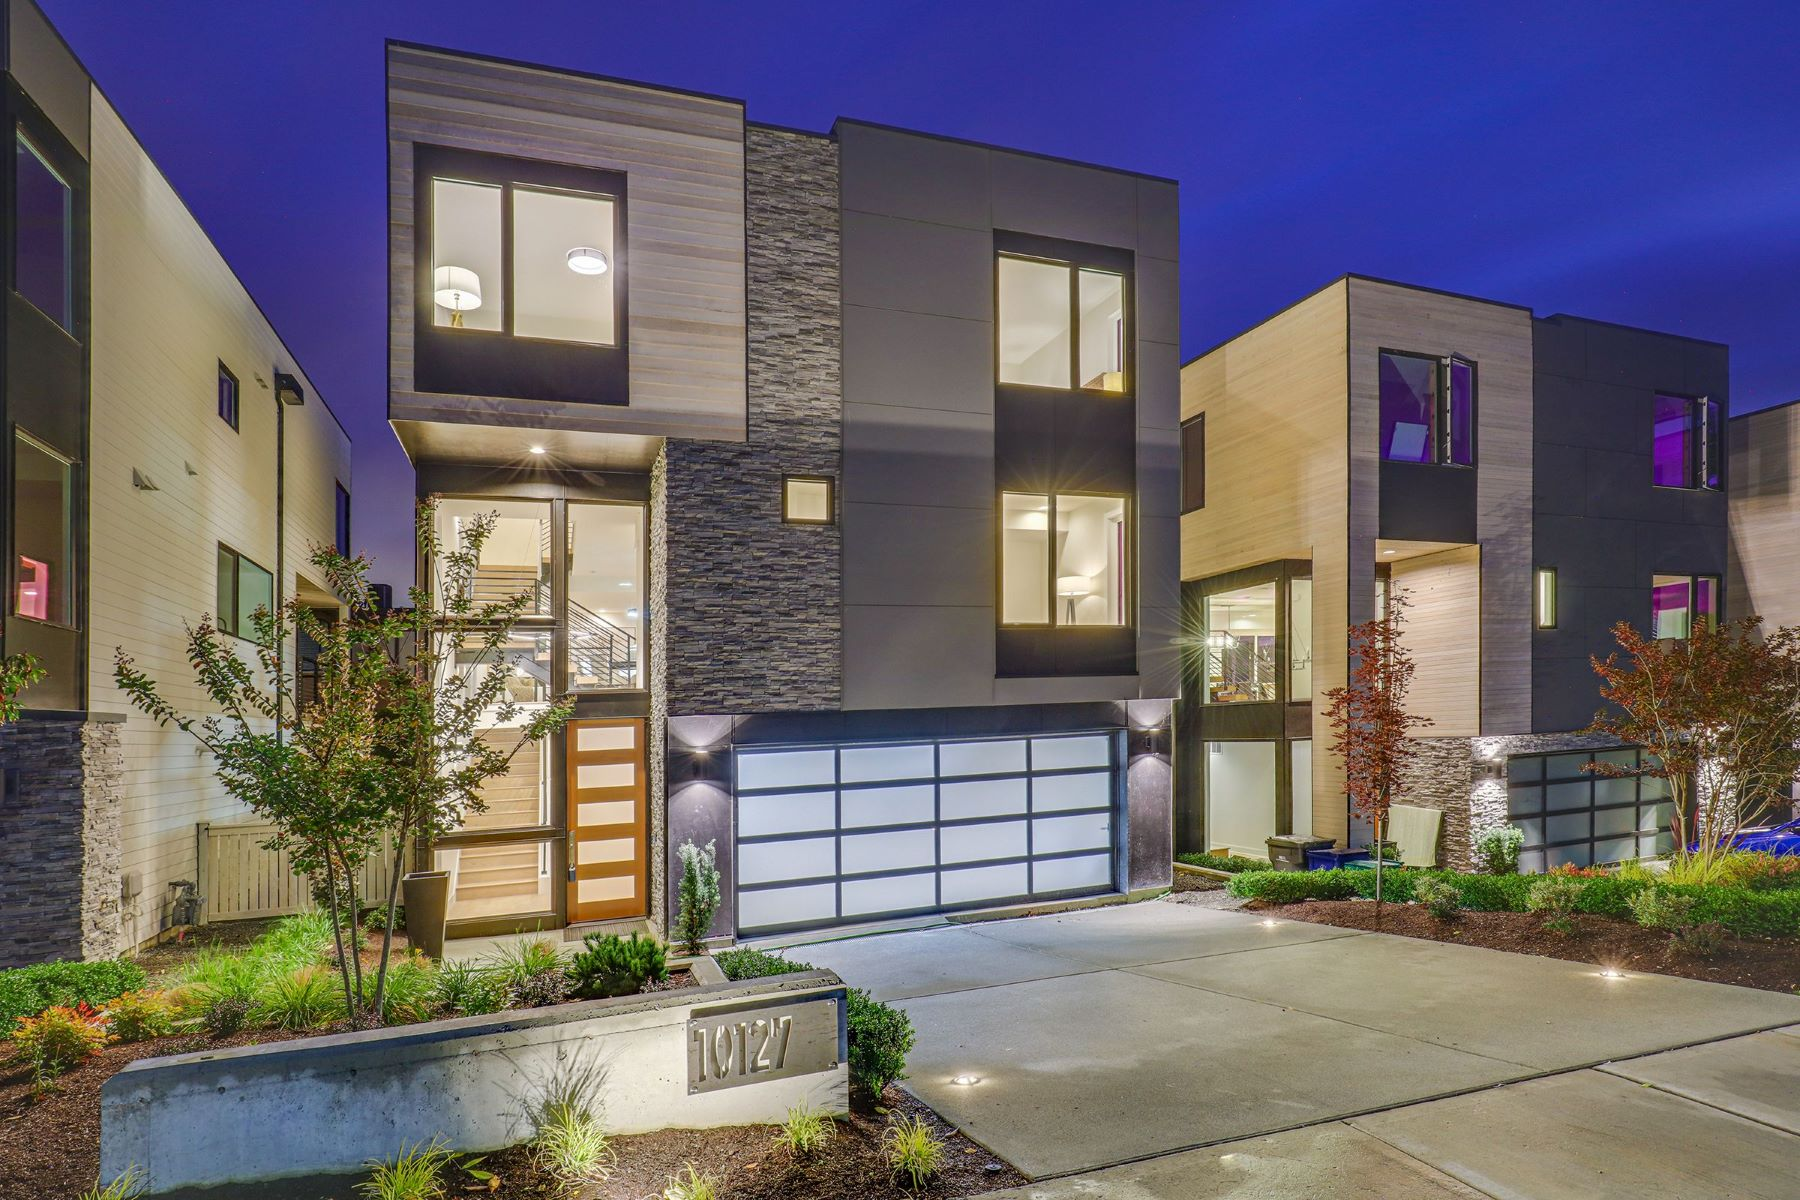 Single Family Homes for Sale at 10131 NE 60th St Unit #4, Kirkland, WA 98033 10131 NE 60th Street (Lot 4) Kirkland, Washington 98033 United States